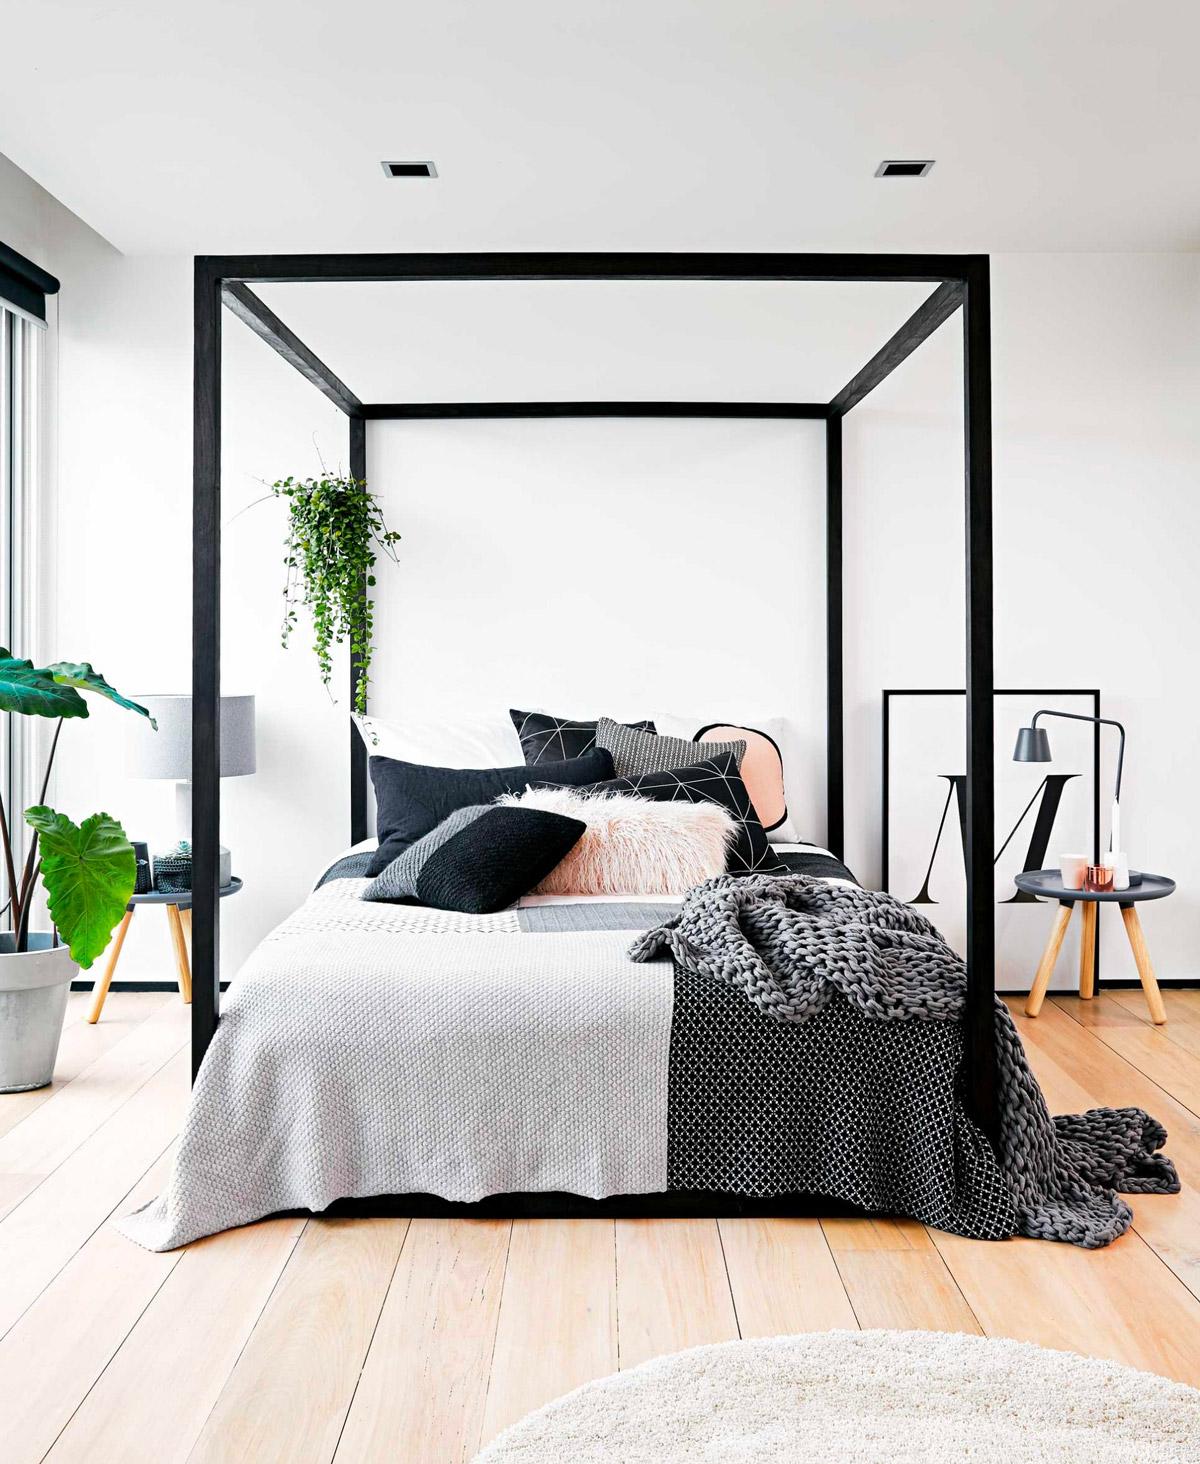 thick-frame-modern-four-poster-bed.jpg